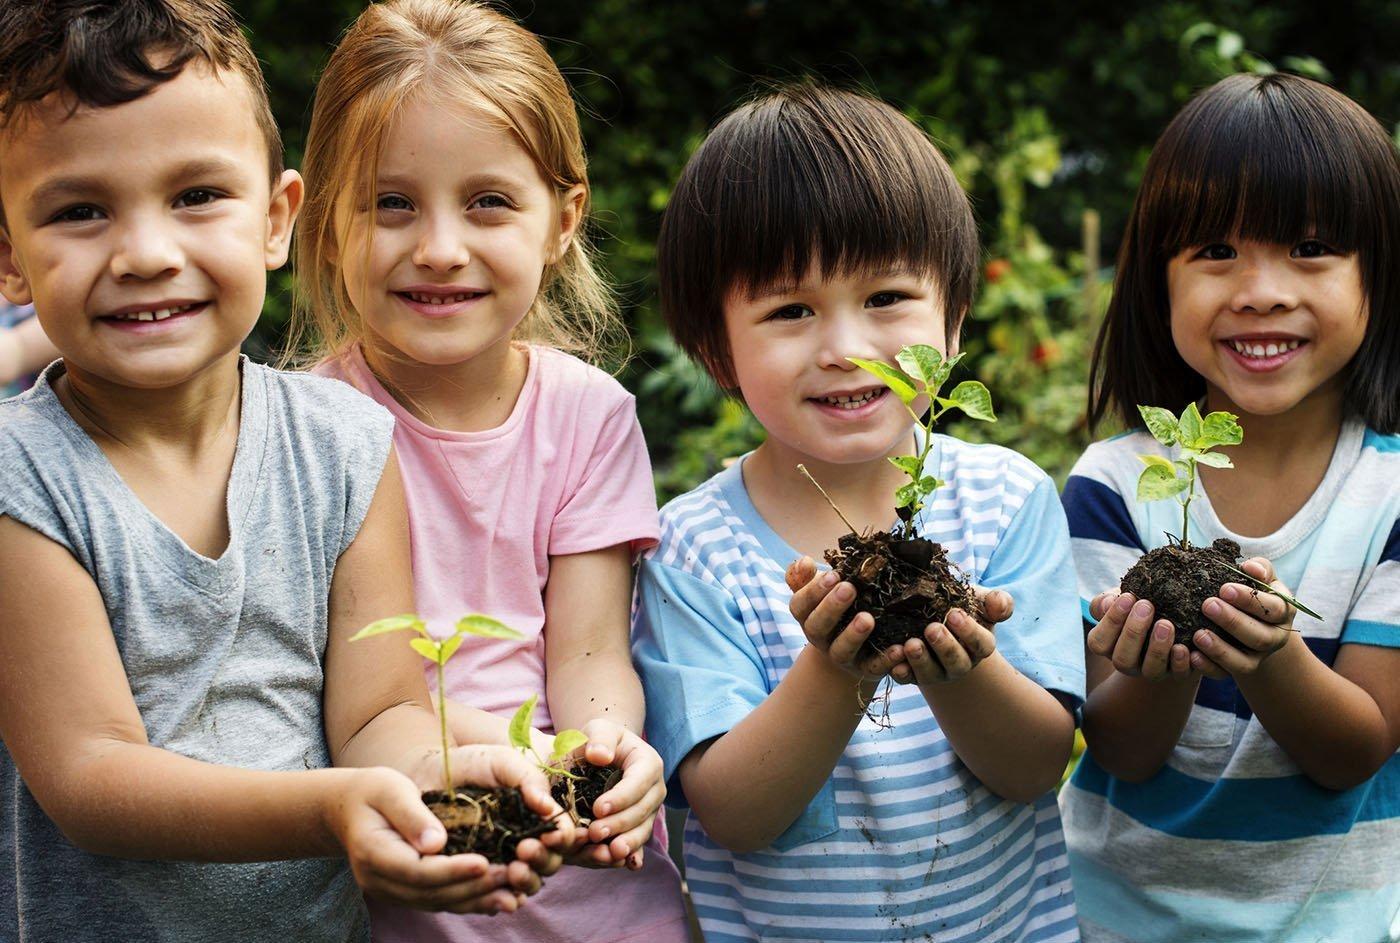 The Basics to Gardening With Children